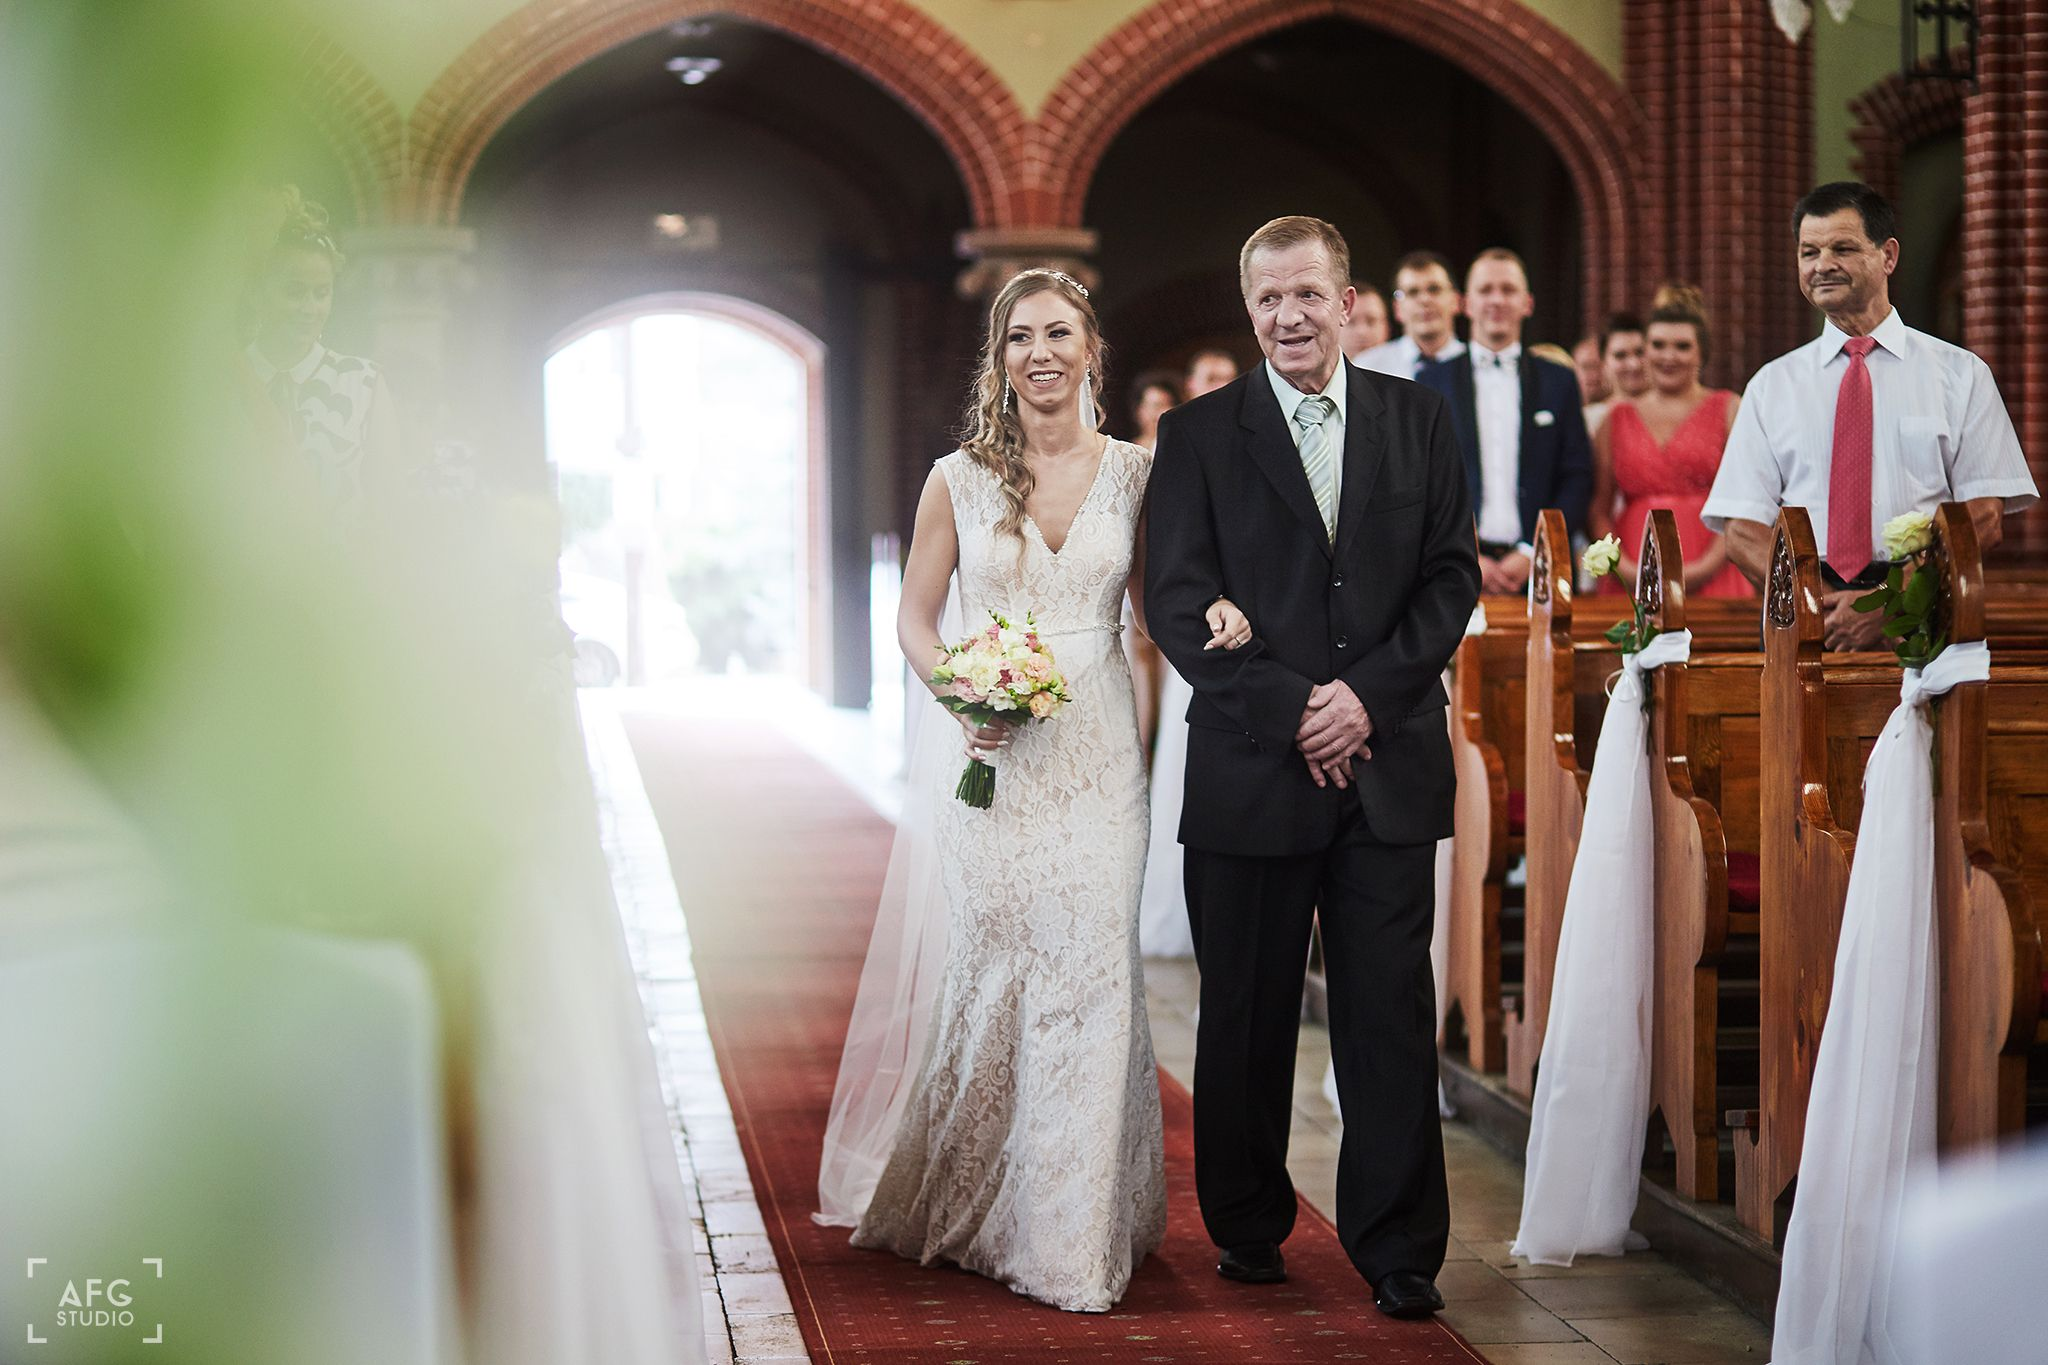 Kościół, Pani Młoda, suknia ślubna